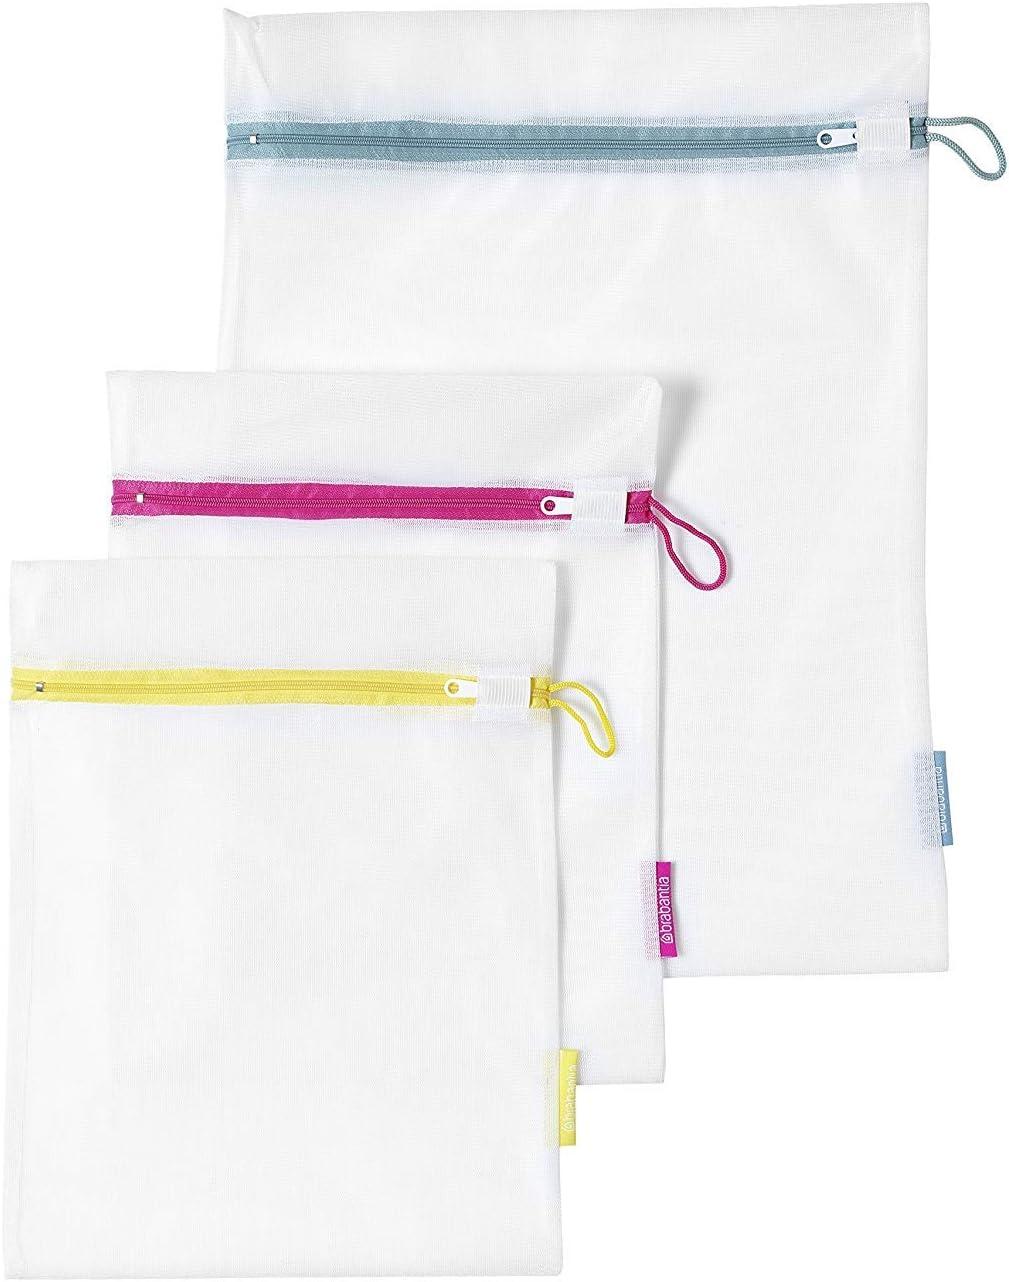 Brabantia 105388 - Juego de 3 bolsas para lavadora, 2 de 33 x 25 cm, 1 de 45 x 33 cm, blanco